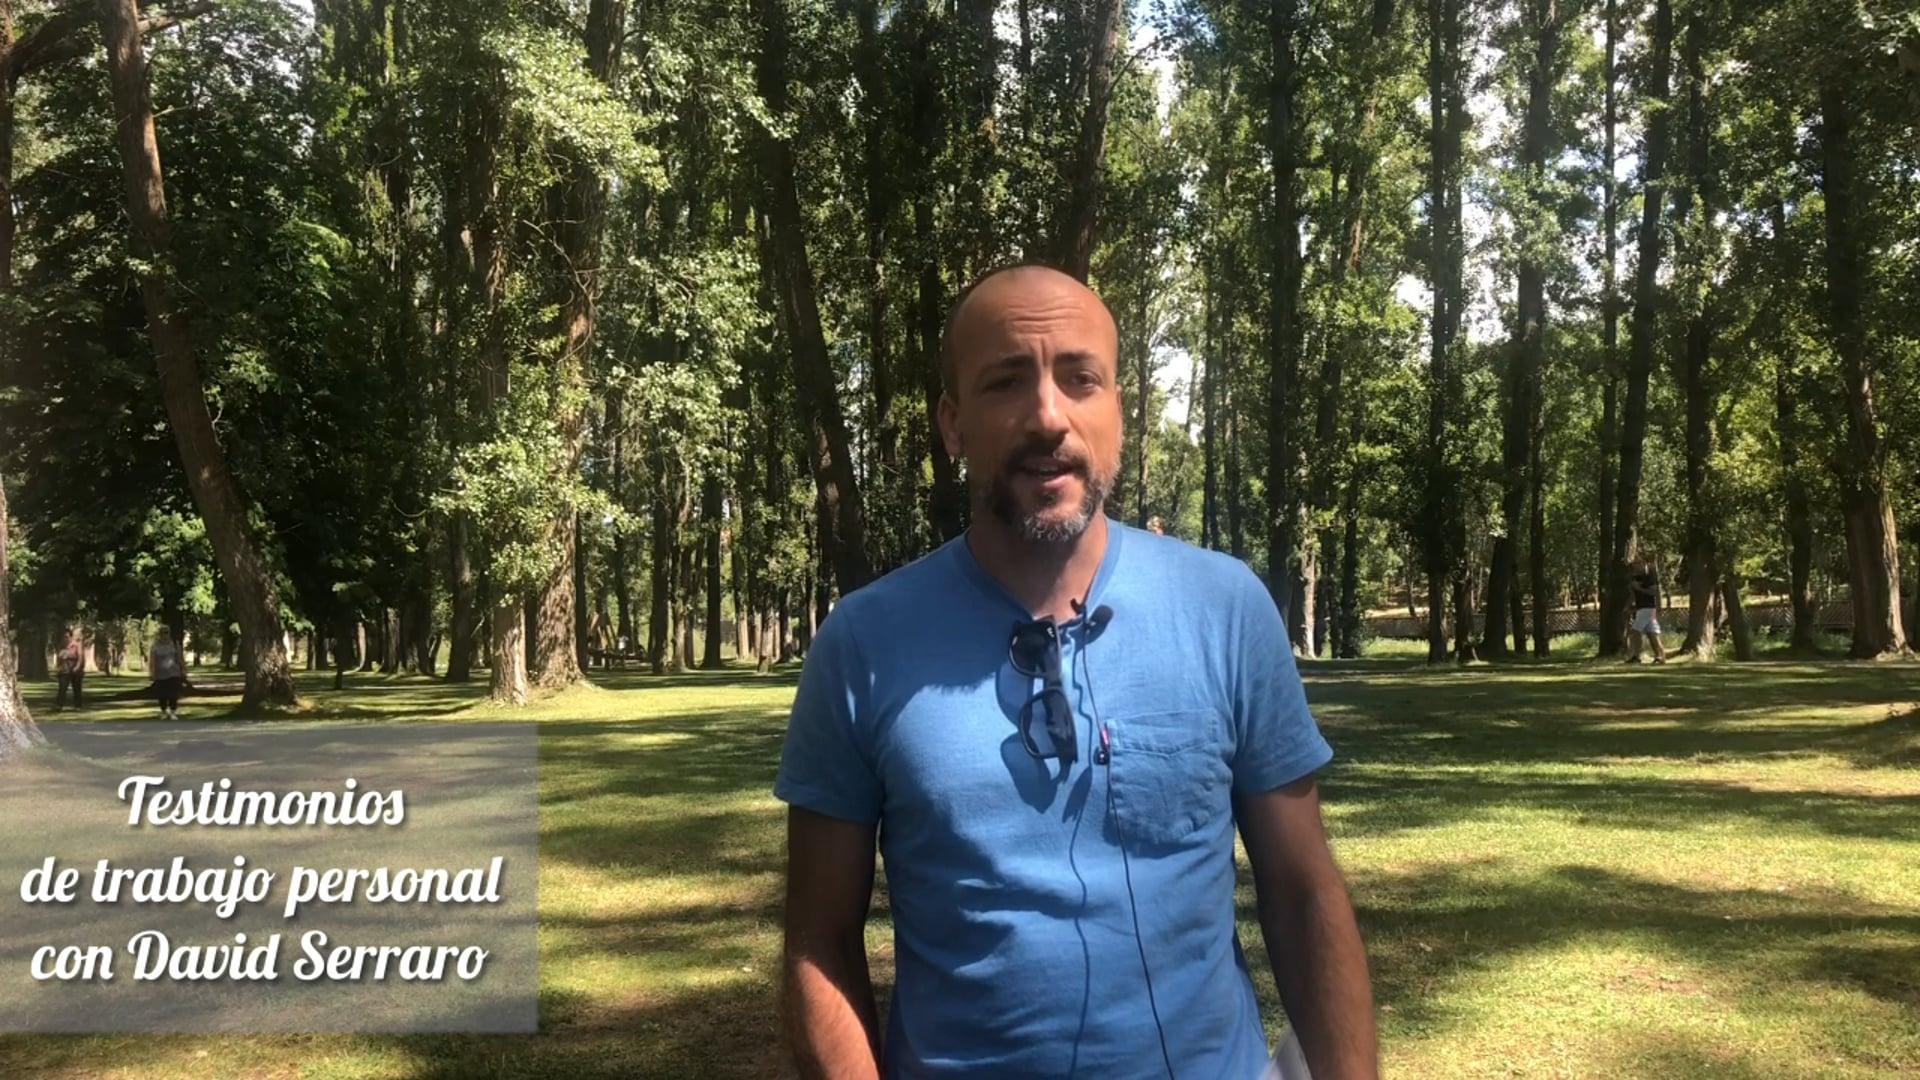 Testimonio de trabajo personal con David Serrato